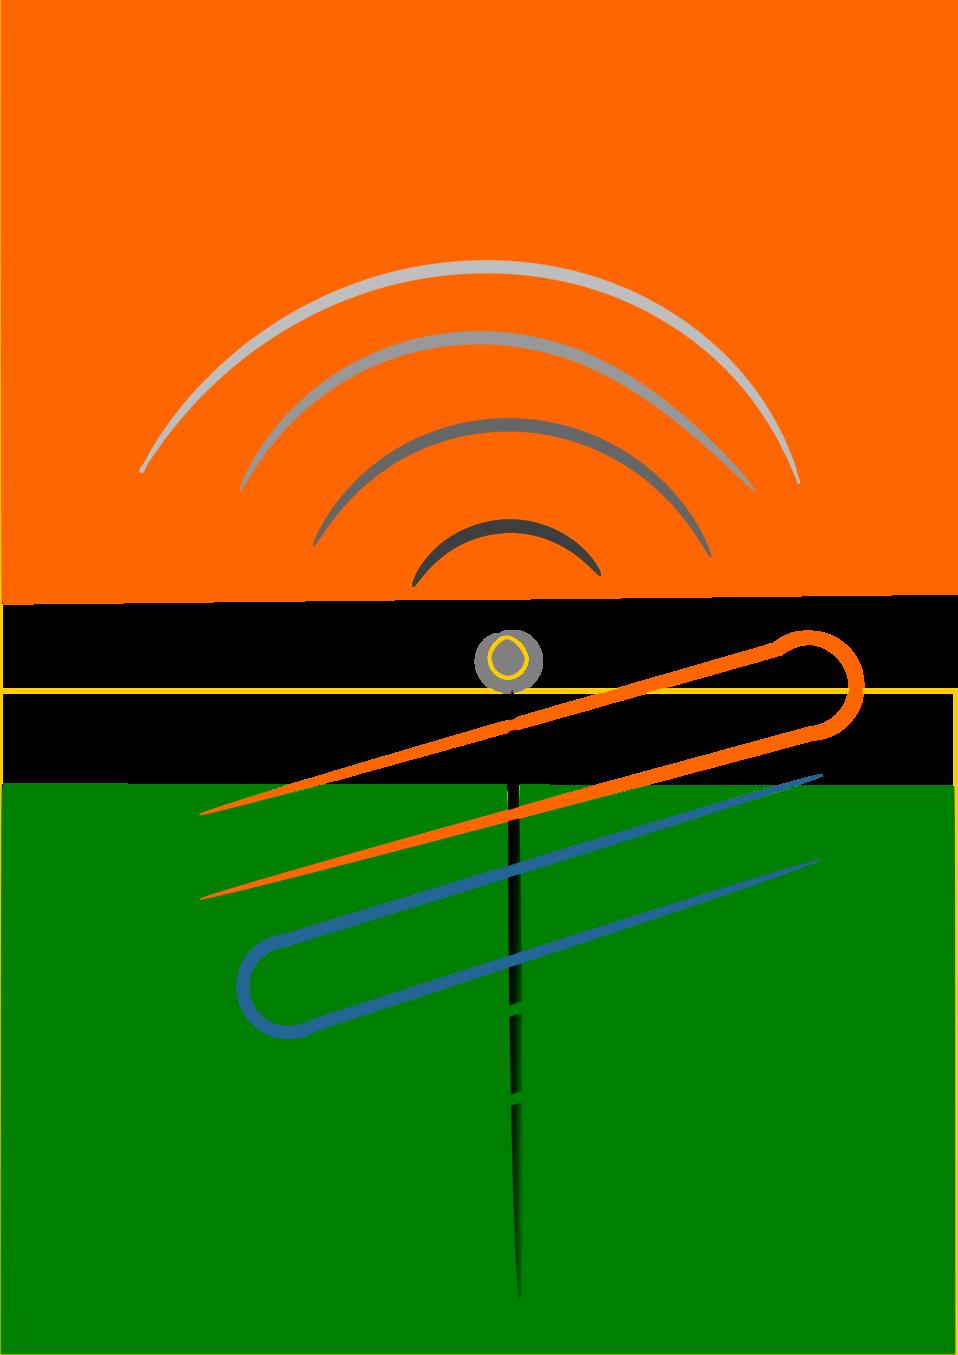 Independence Antenna